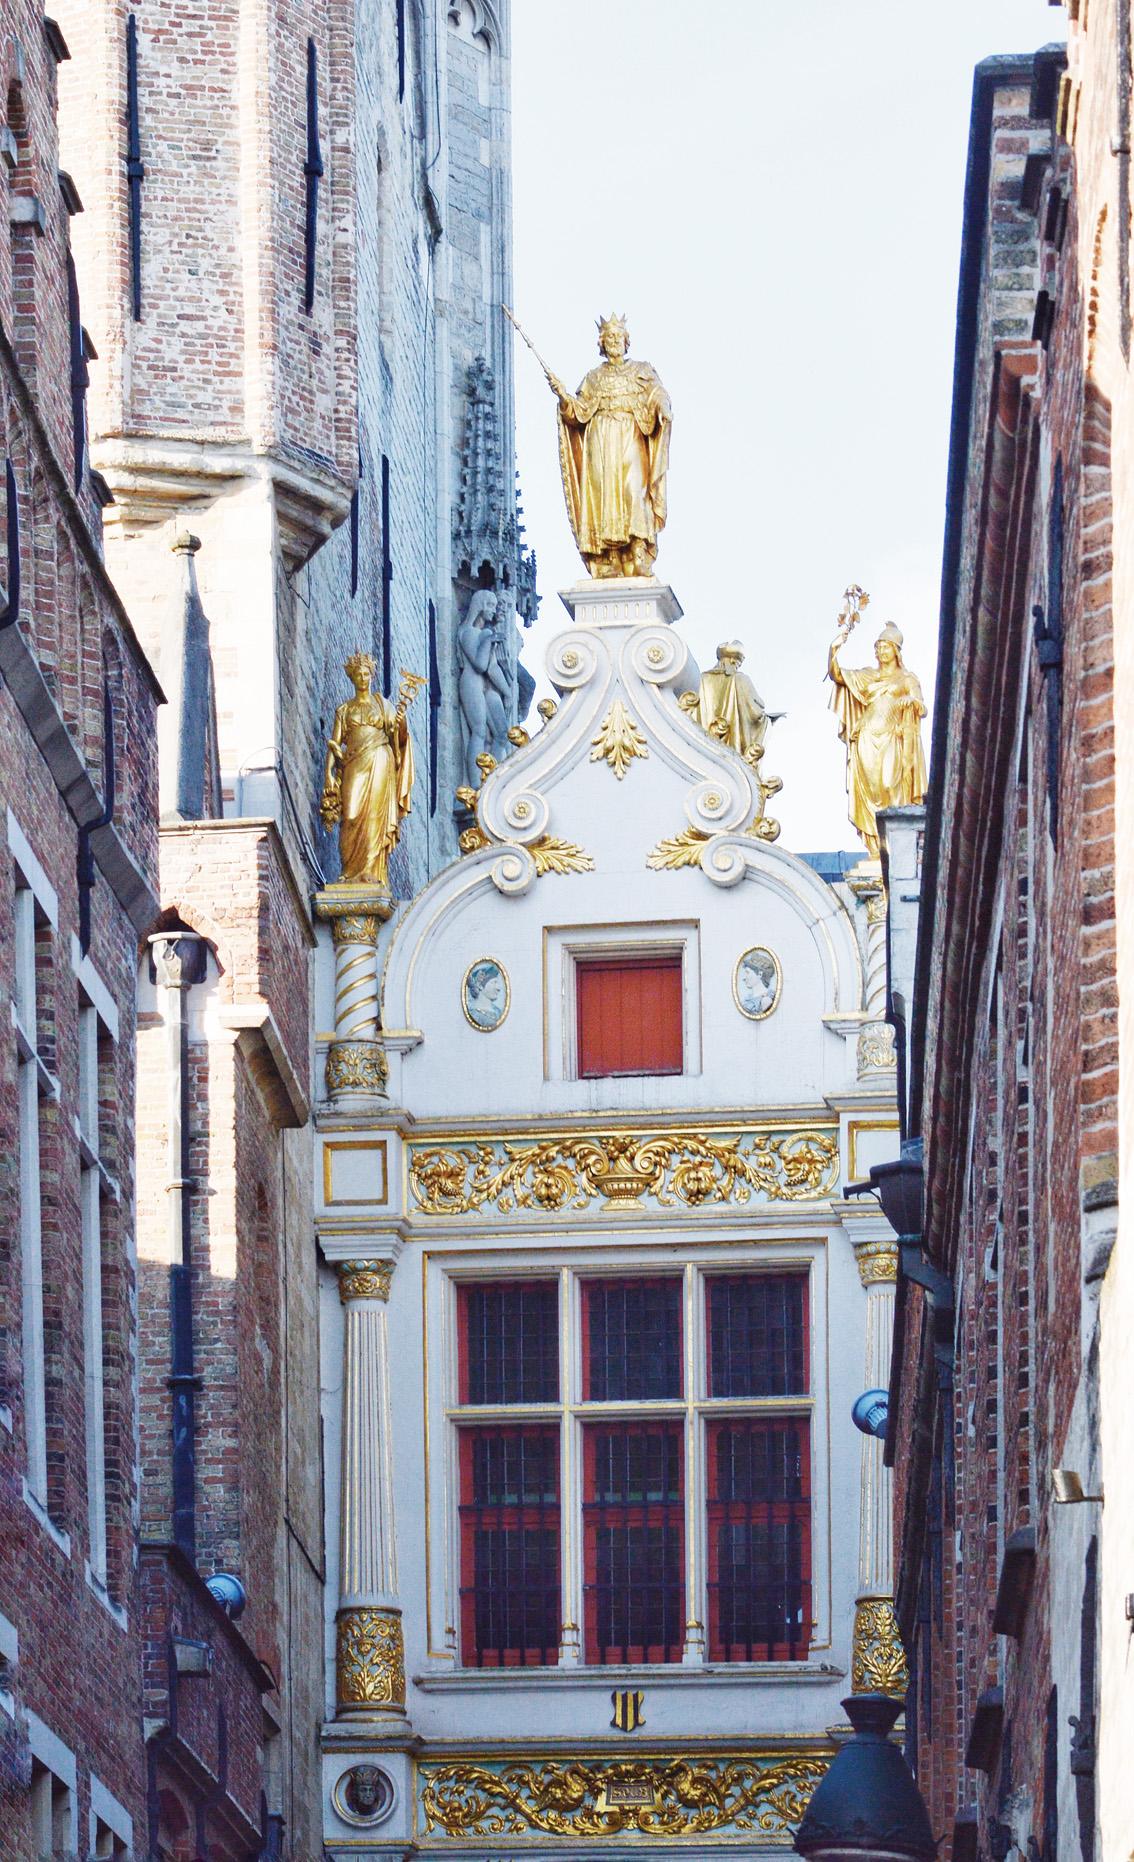 28-1 Un weekend in Belgio. Alla scoperta delle Fiandre: Bruges .